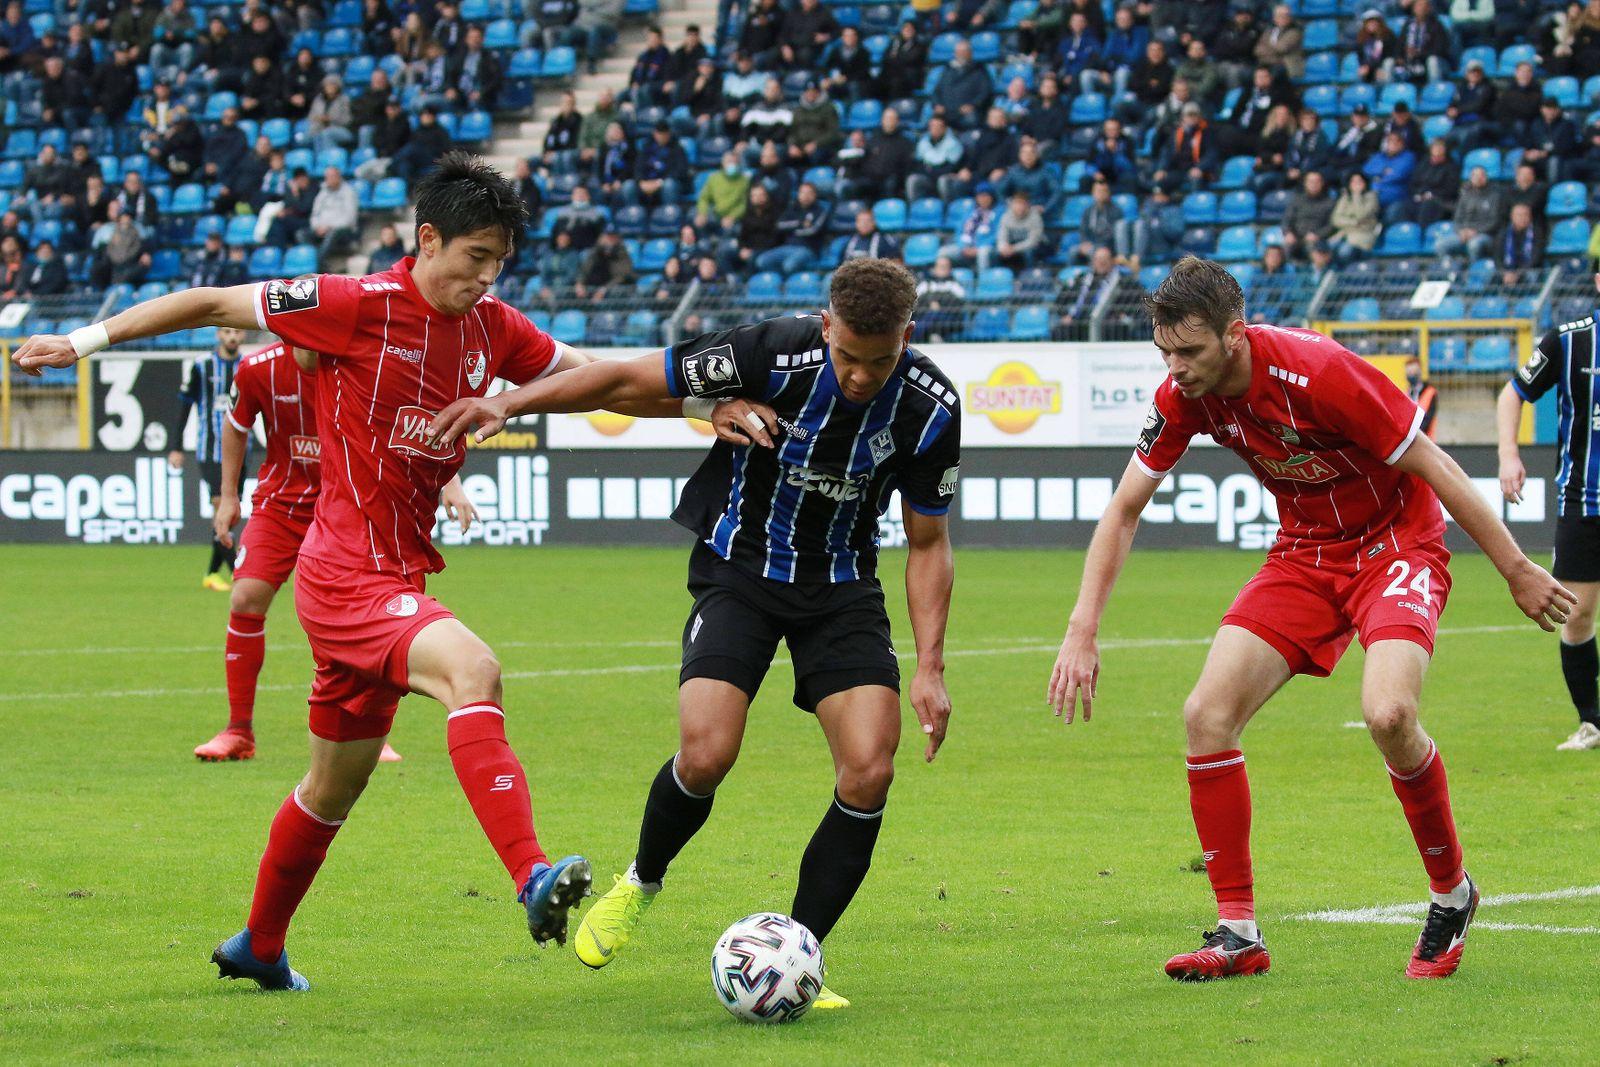 03.10.2020, xavx, Fussball 3.Liga, SV Waldhof Mannheim - Tuerkguecue Muenchen emspor, v.l. Yi-young Park (T¸rkg¸c¸ M¸nch